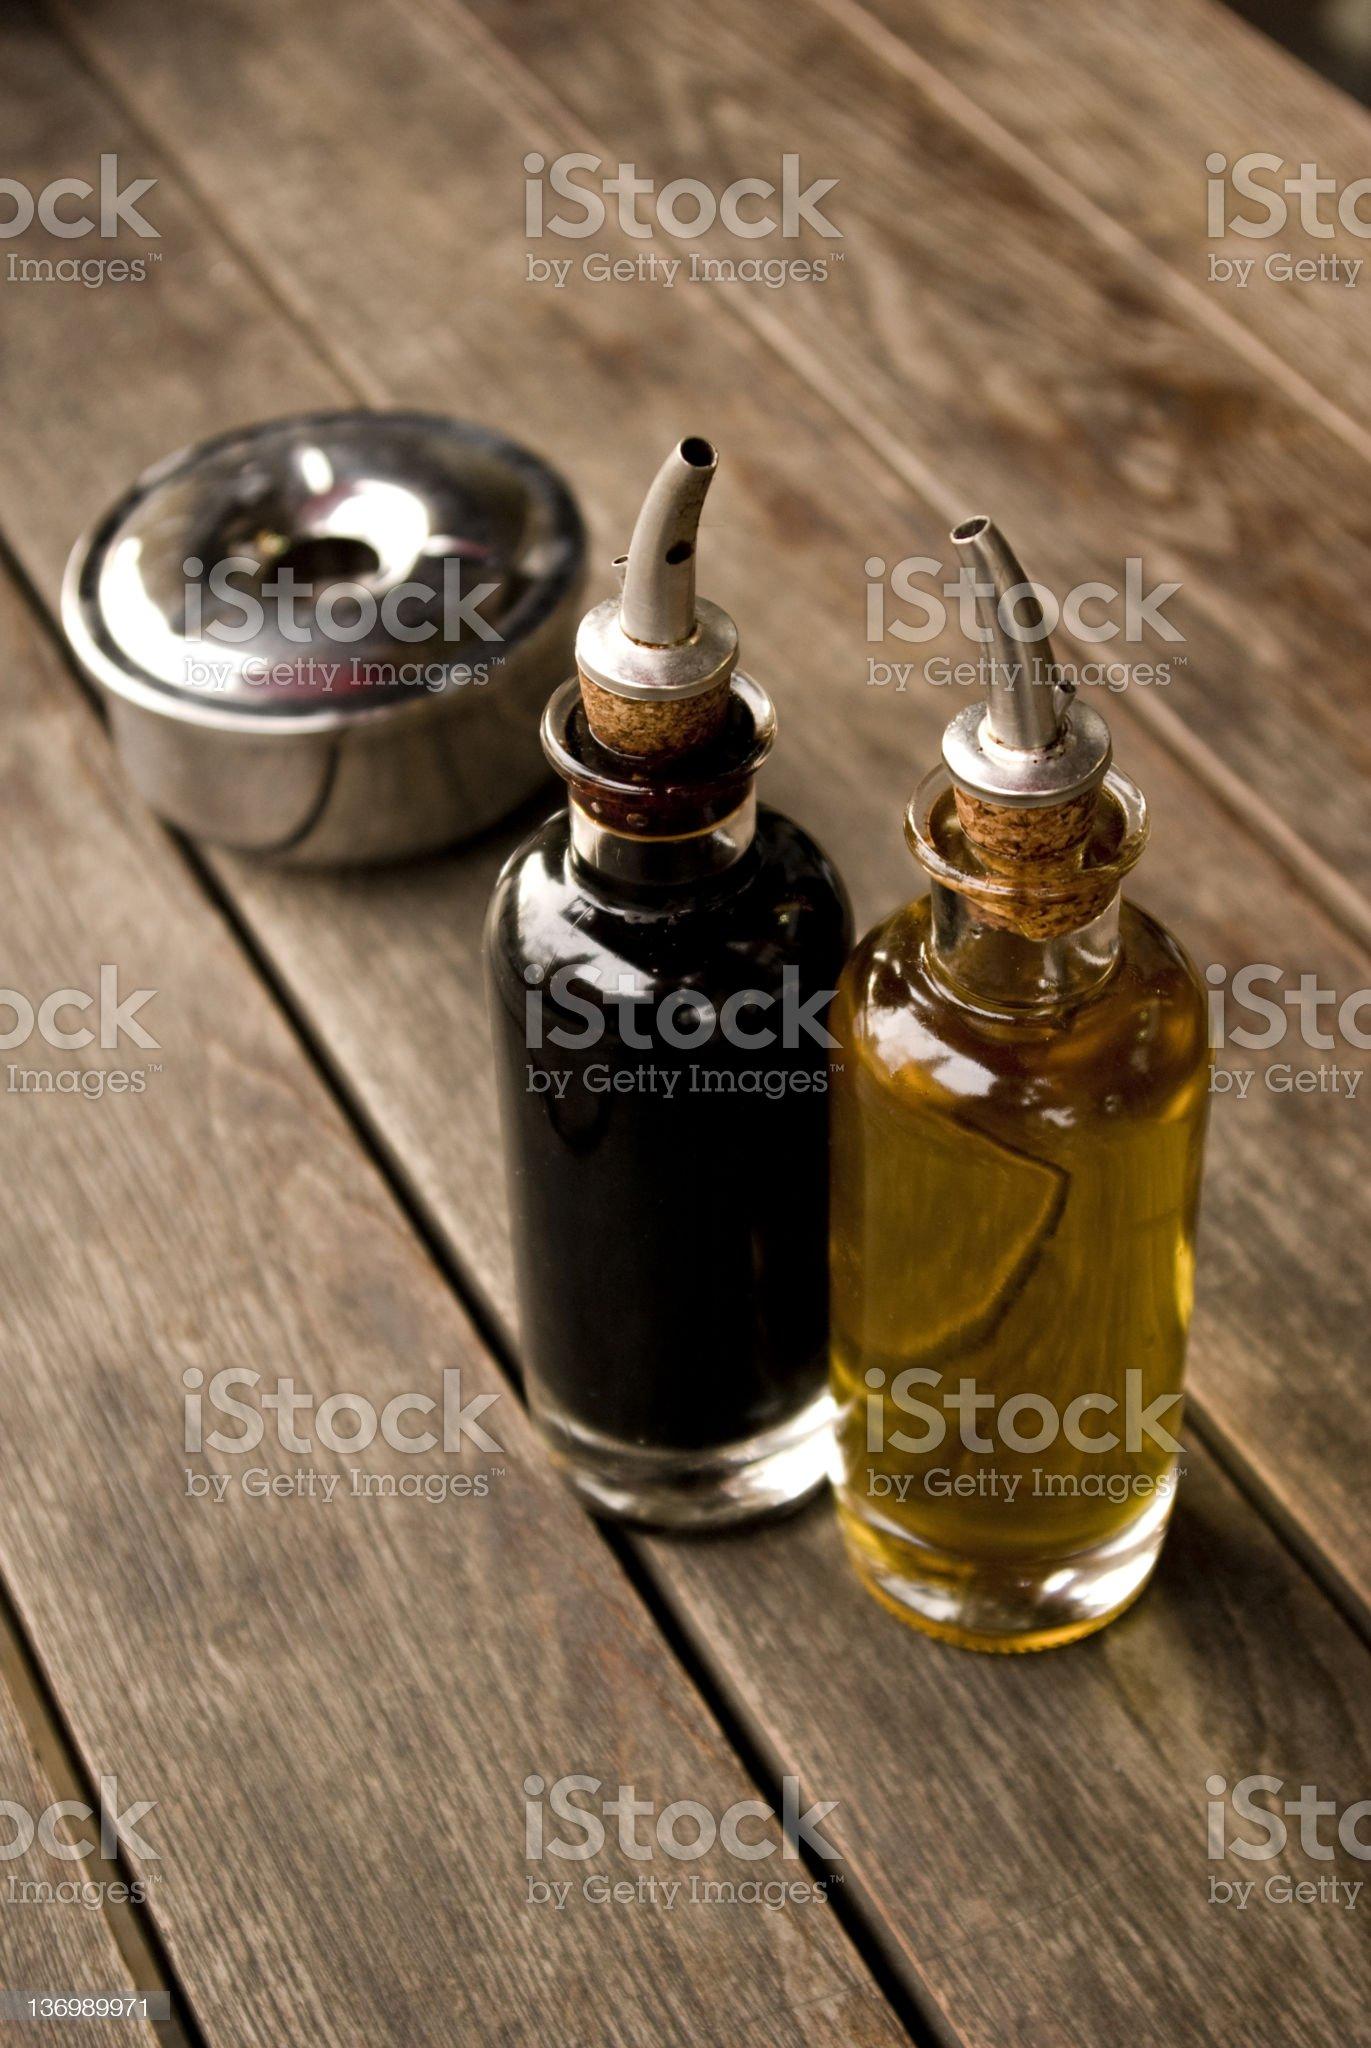 Oil & Vinegar royalty-free stock photo